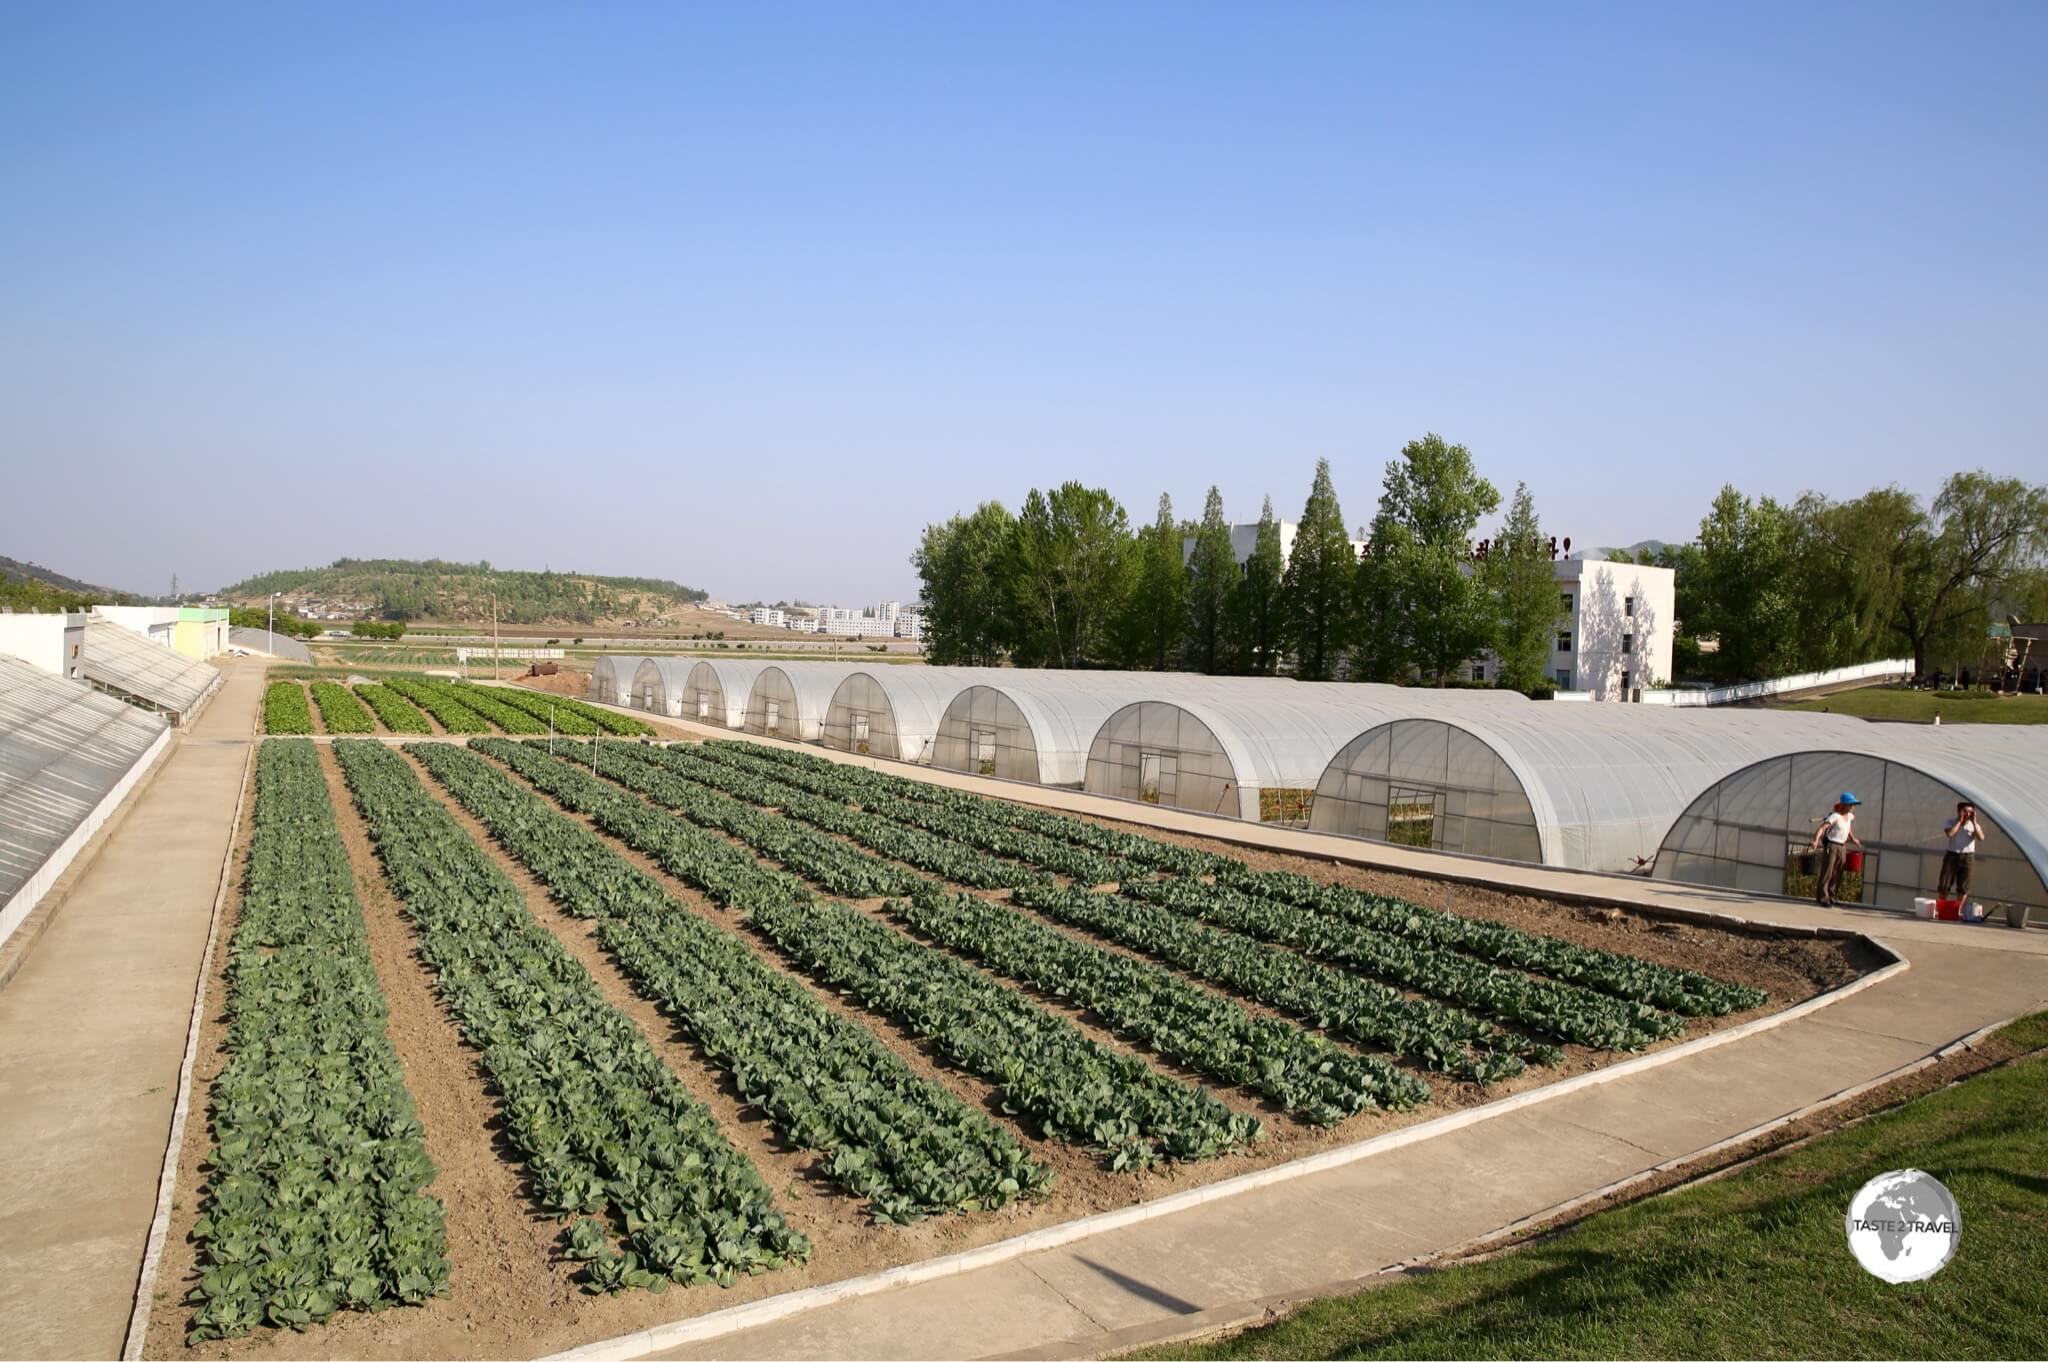 Vegetable gardens at the Chongsan-ri Cooperative Farm near Nampo.